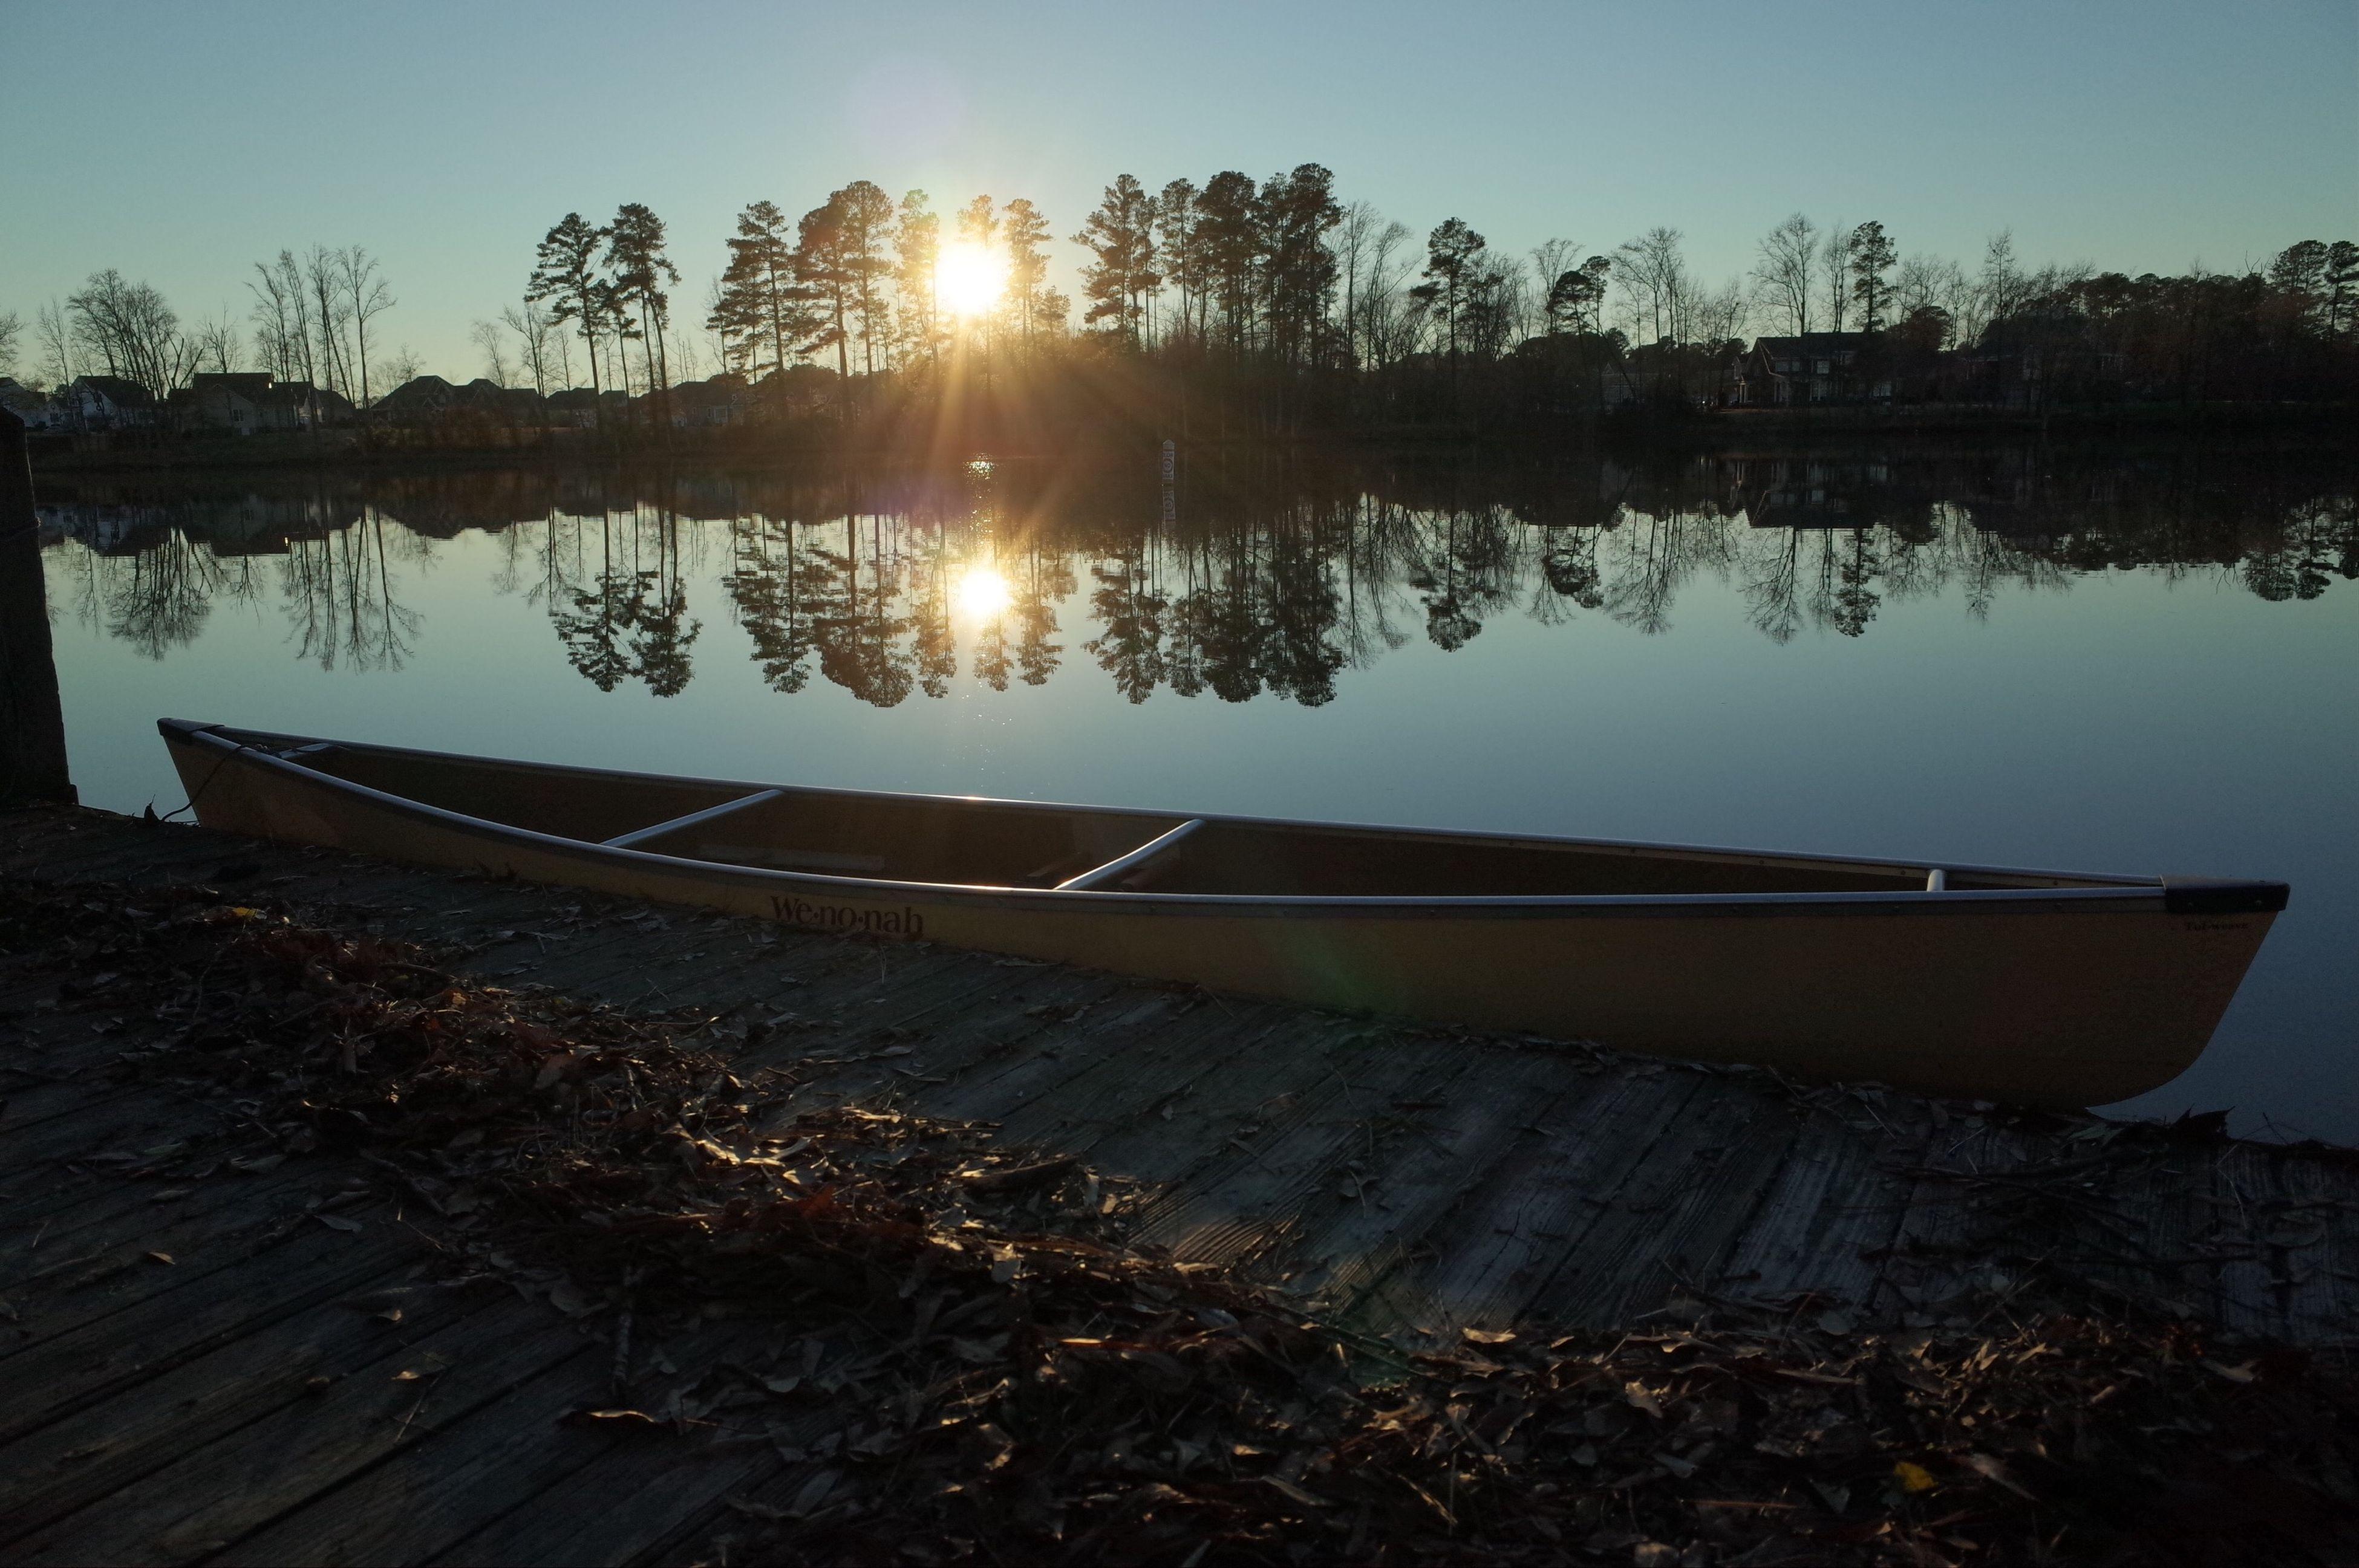 sun, water, sunset, sunlight, reflection, sky, lake, tranquility, tranquil scene, nautical vessel, boat, moored, nature, scenics, sunbeam, beach, tree, beauty in nature, transportation, sea